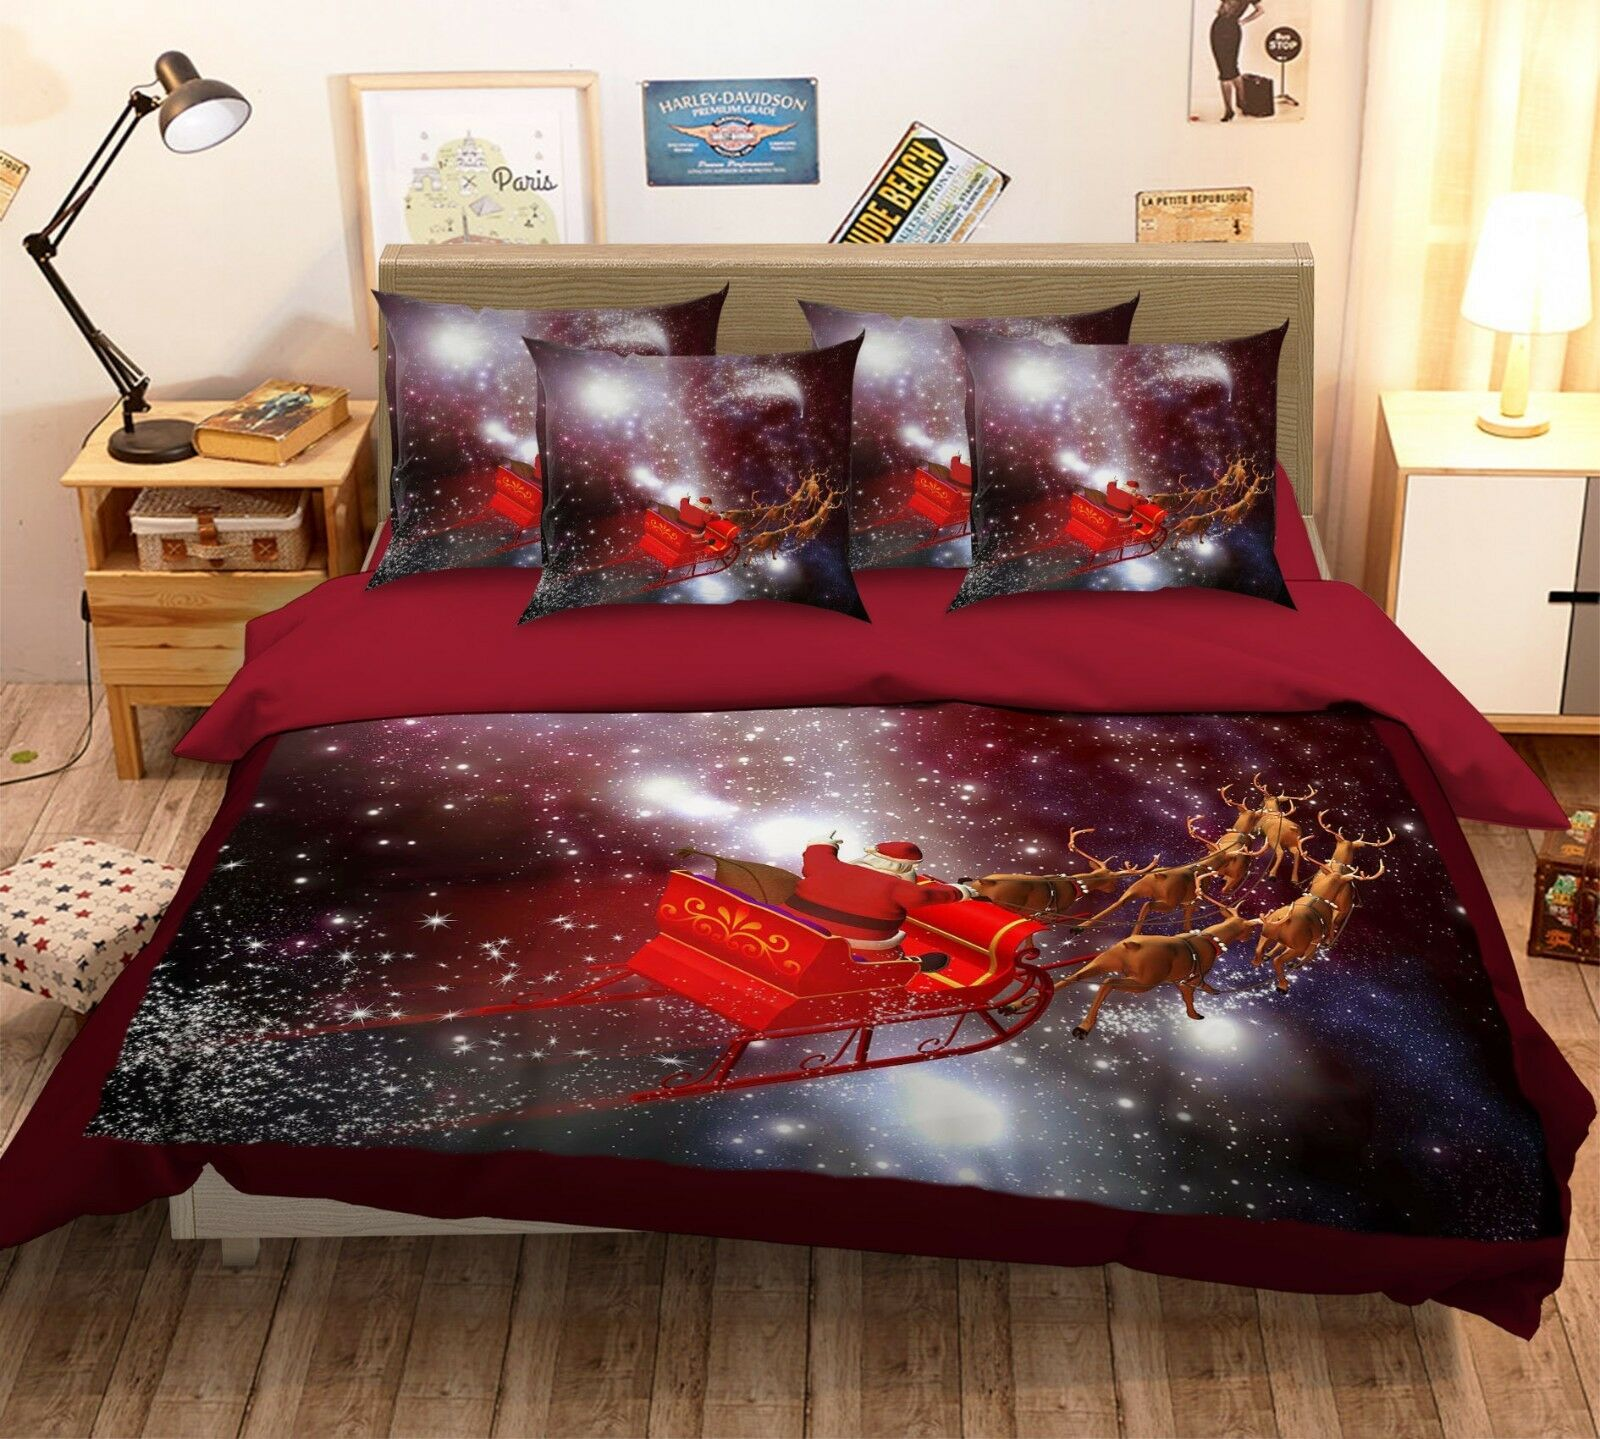 3D Shiny Sky 203 Bett Pillowcases Quilt Duvet Startseite Set Single Königin König Größe AU